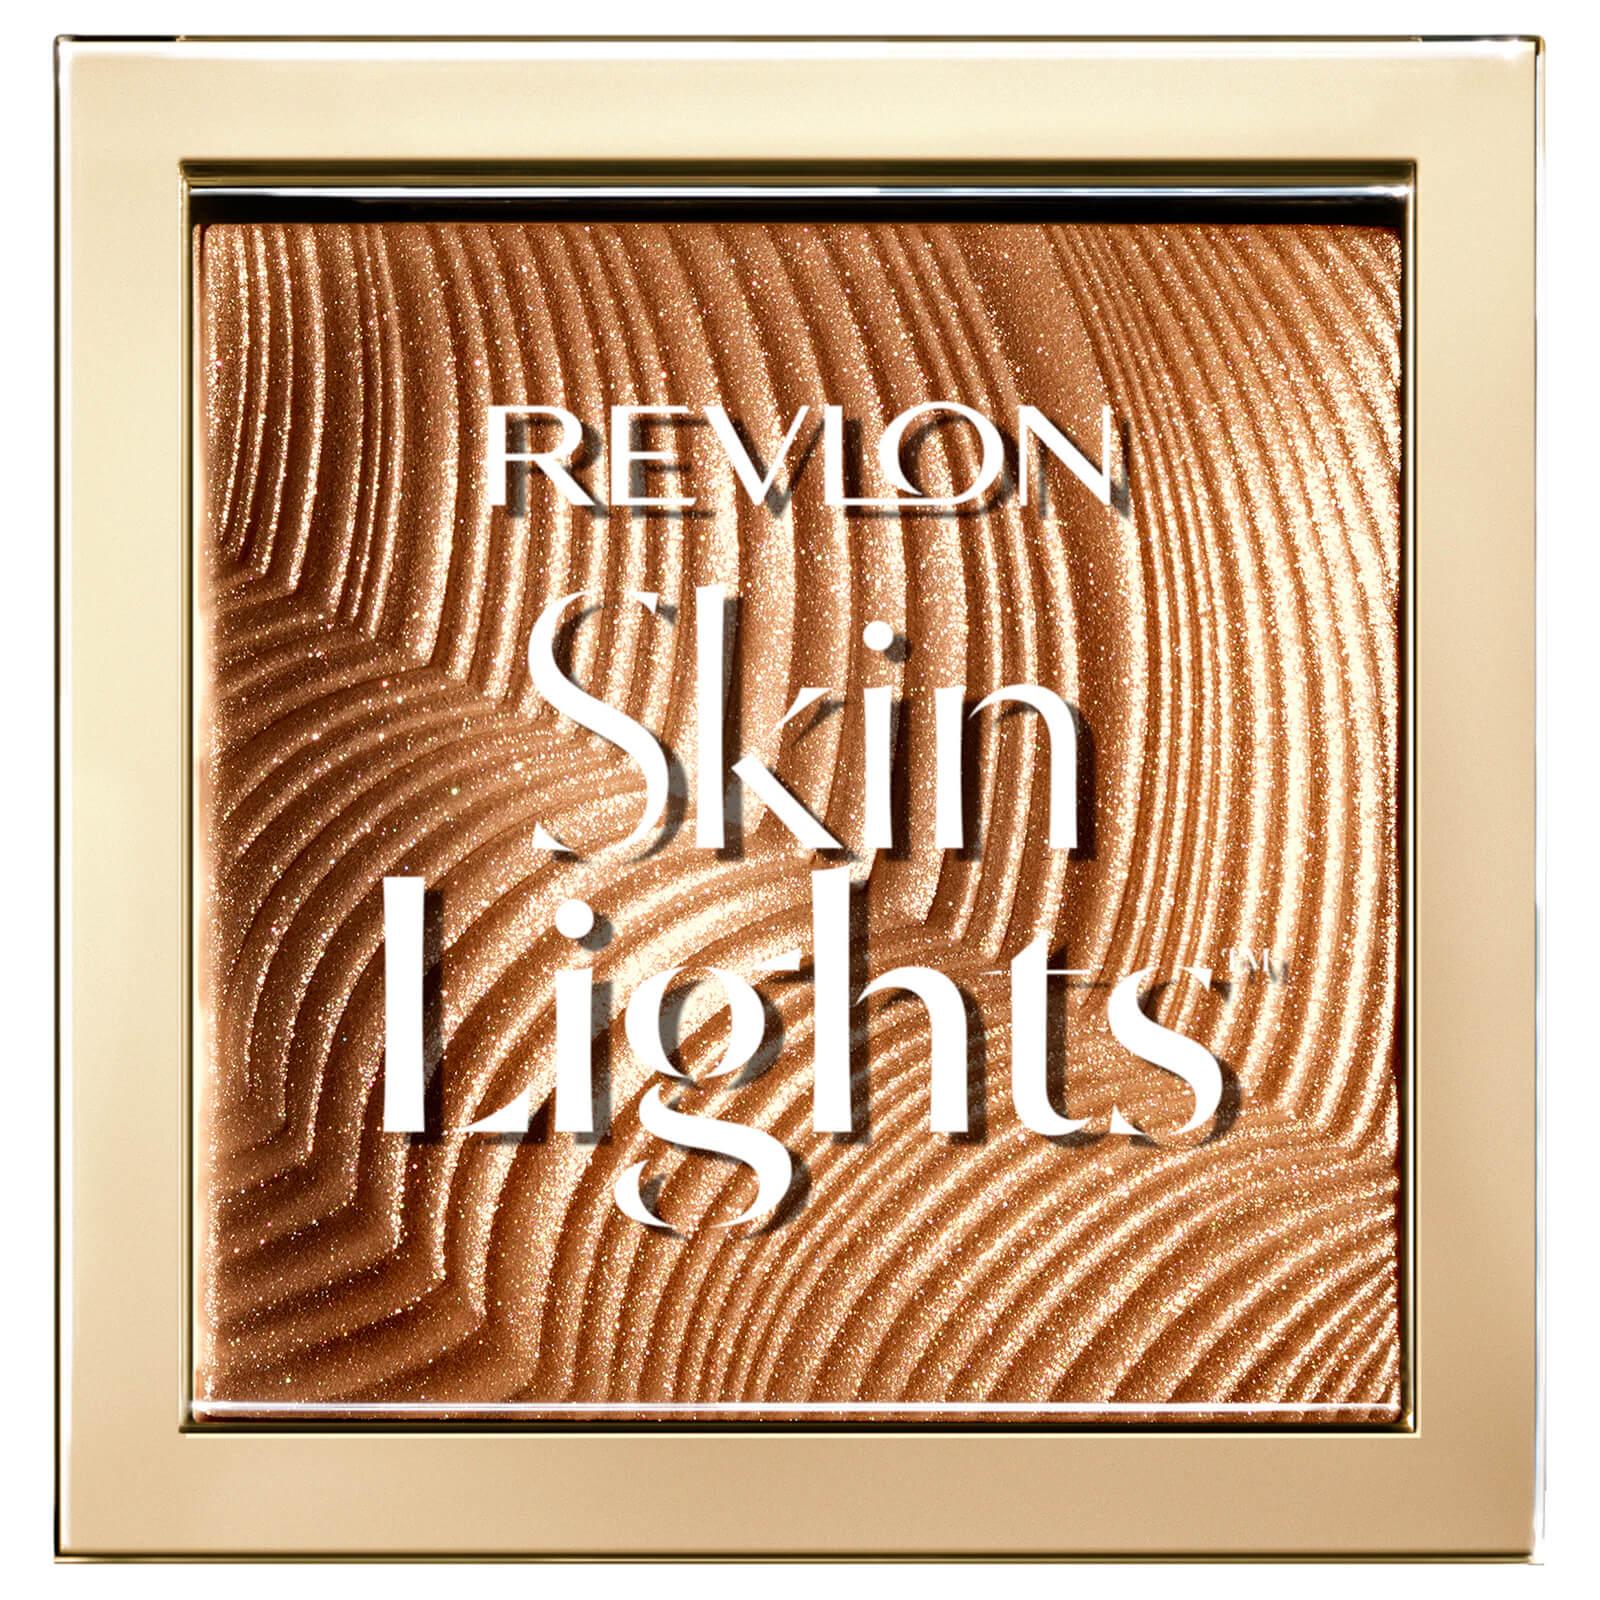 Купить Revlon SkinLightsTM Prismatic Bronzer (Various Shades) - Sunlit Glow